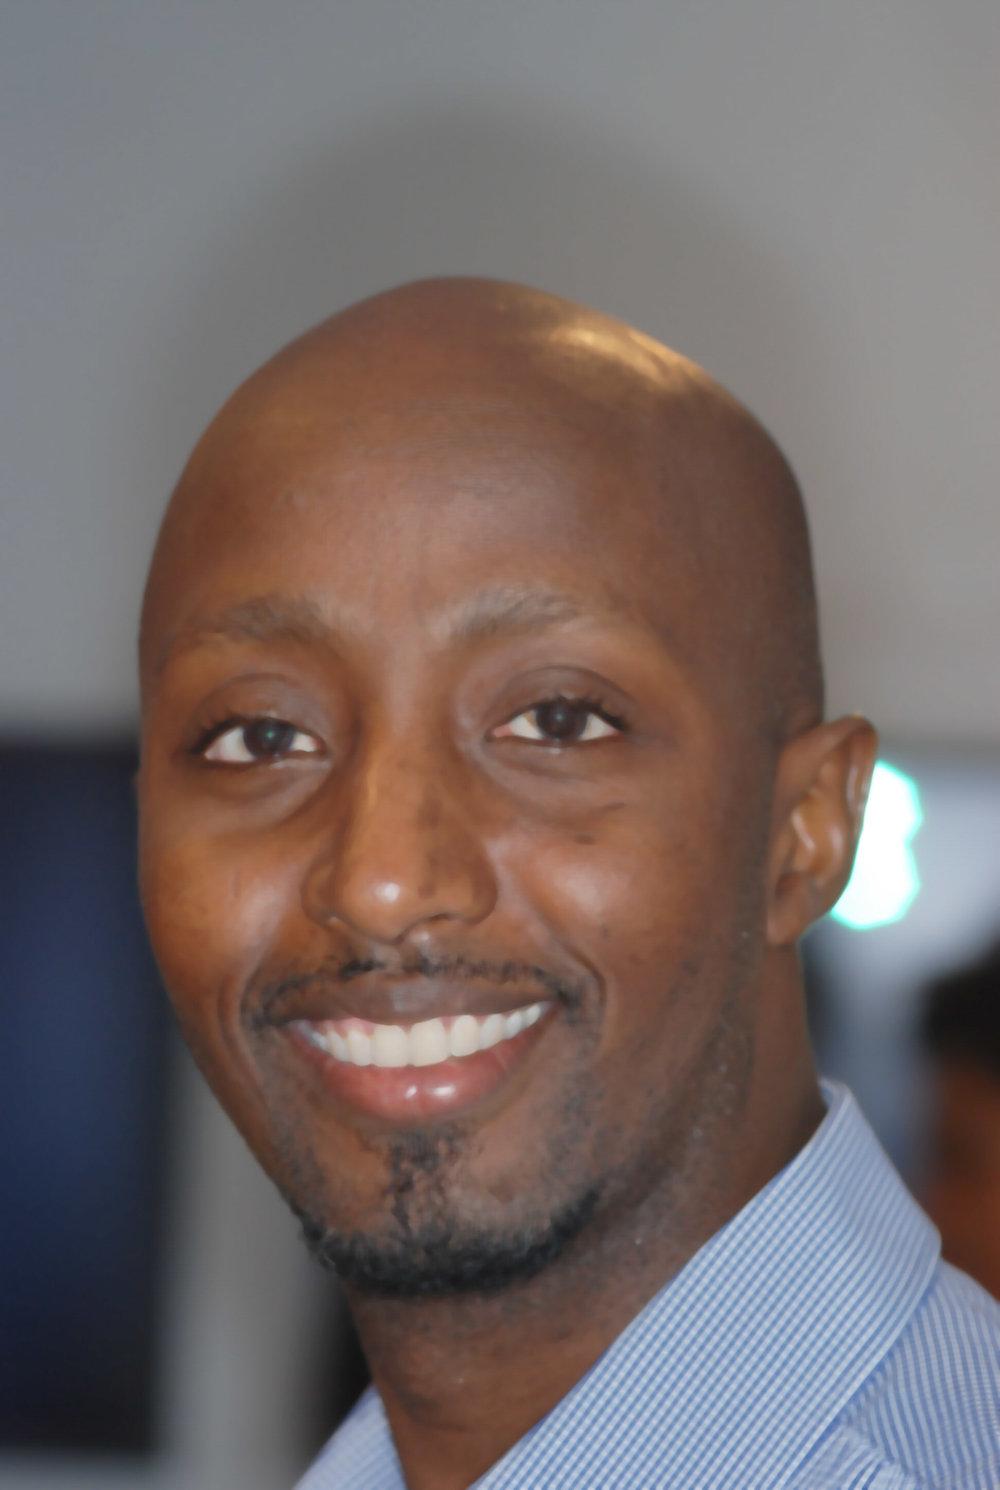 Bashir Munye Prfile picture.jpg